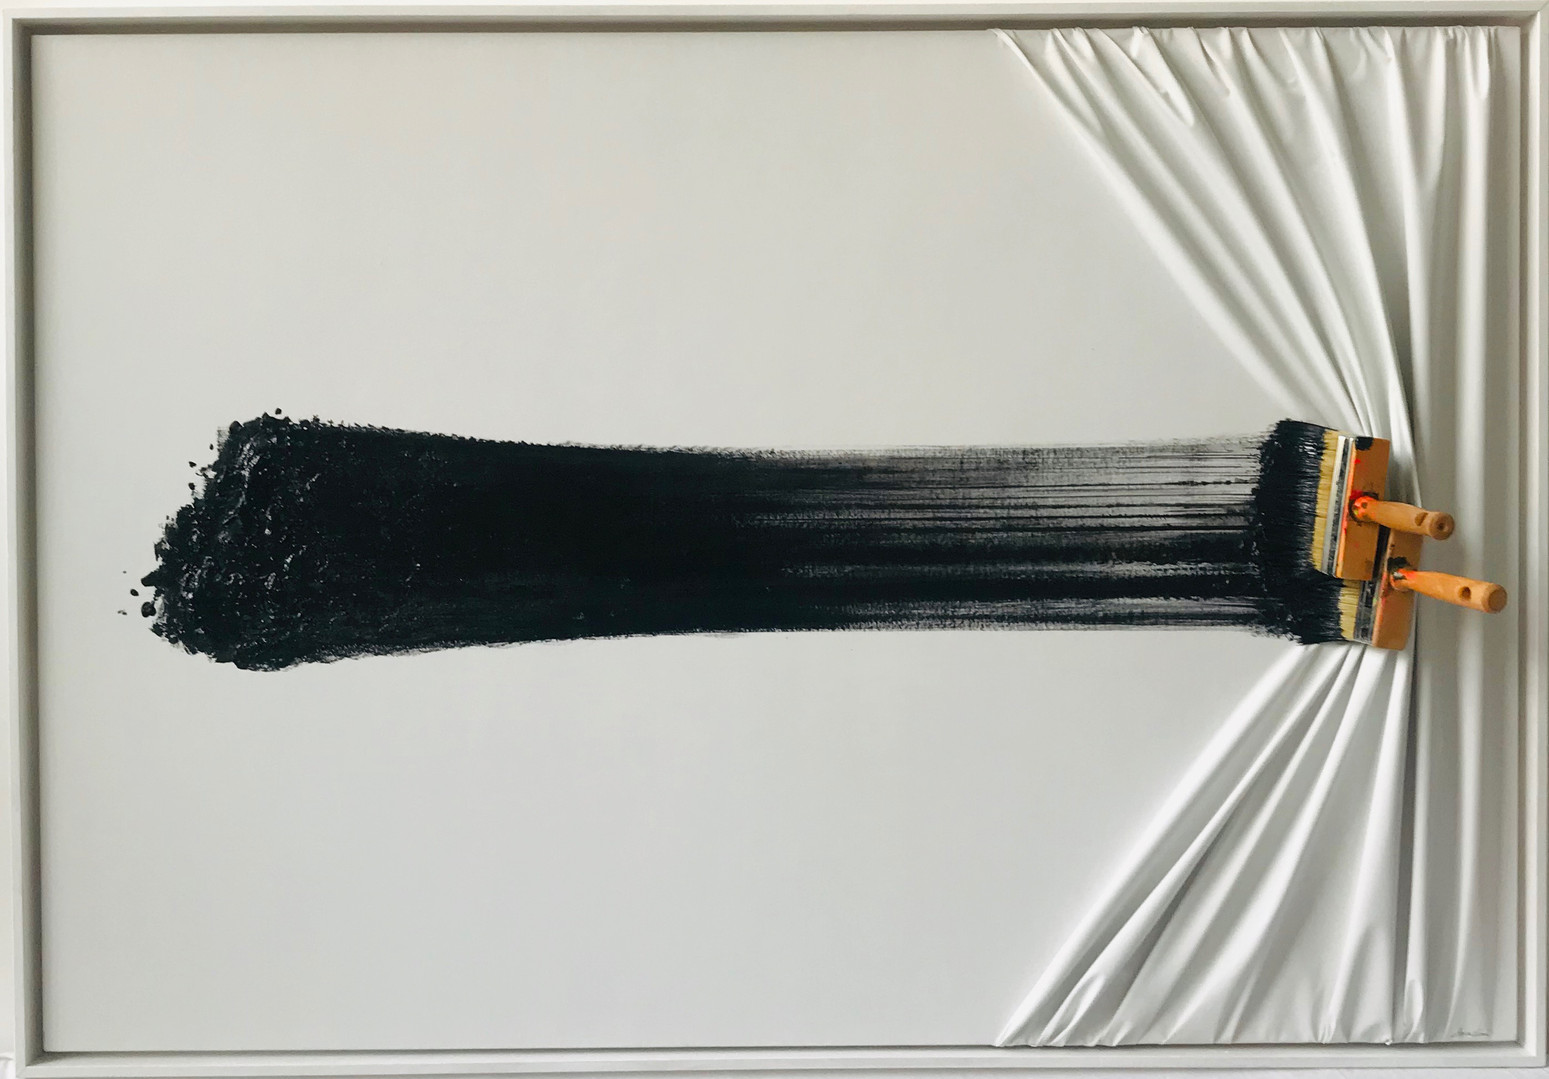 jean-paul-donadini-double-brosse-arretee